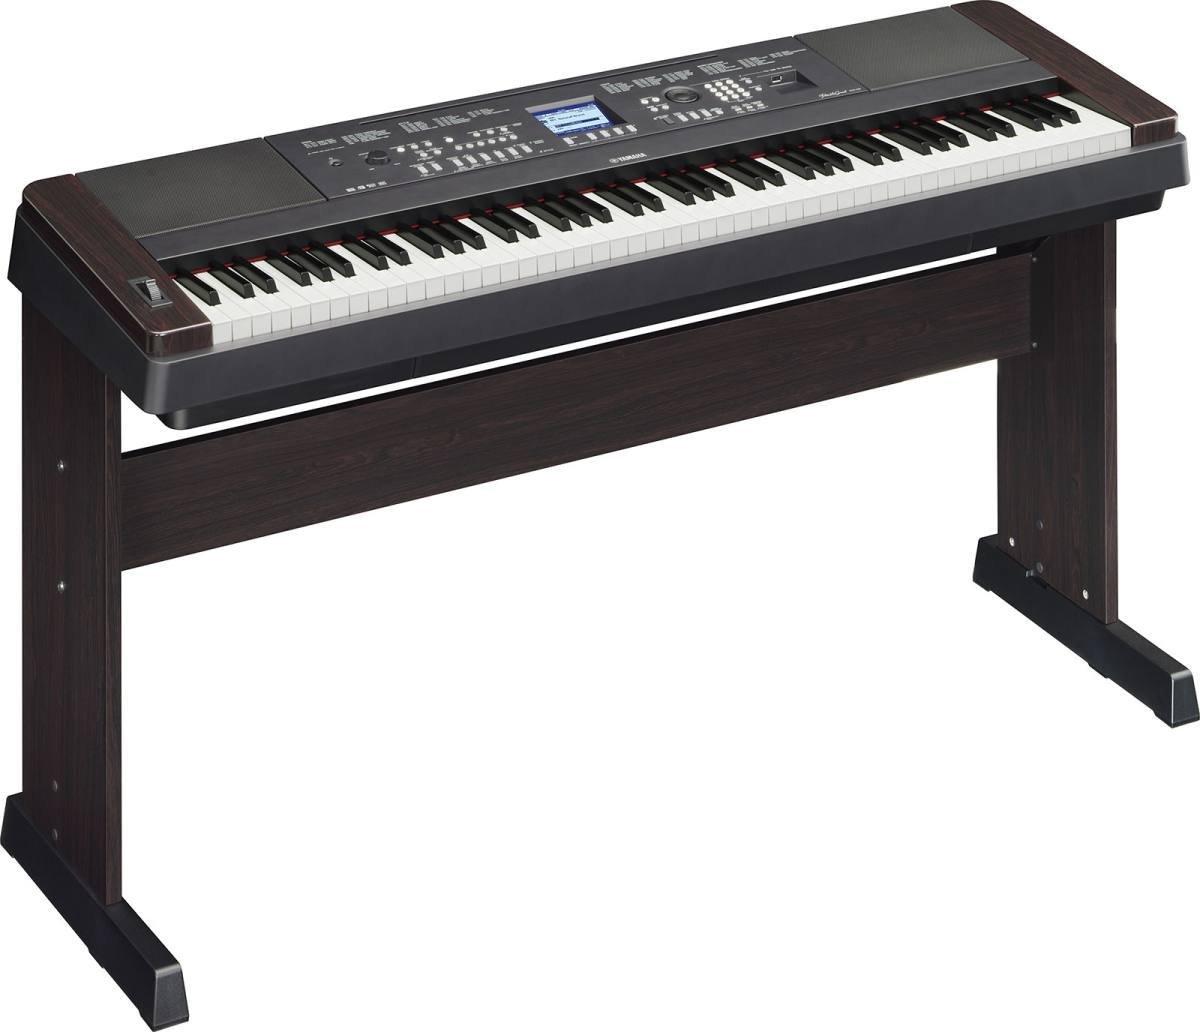 Yamaha DGX650B Digital Piano by YAMAHA